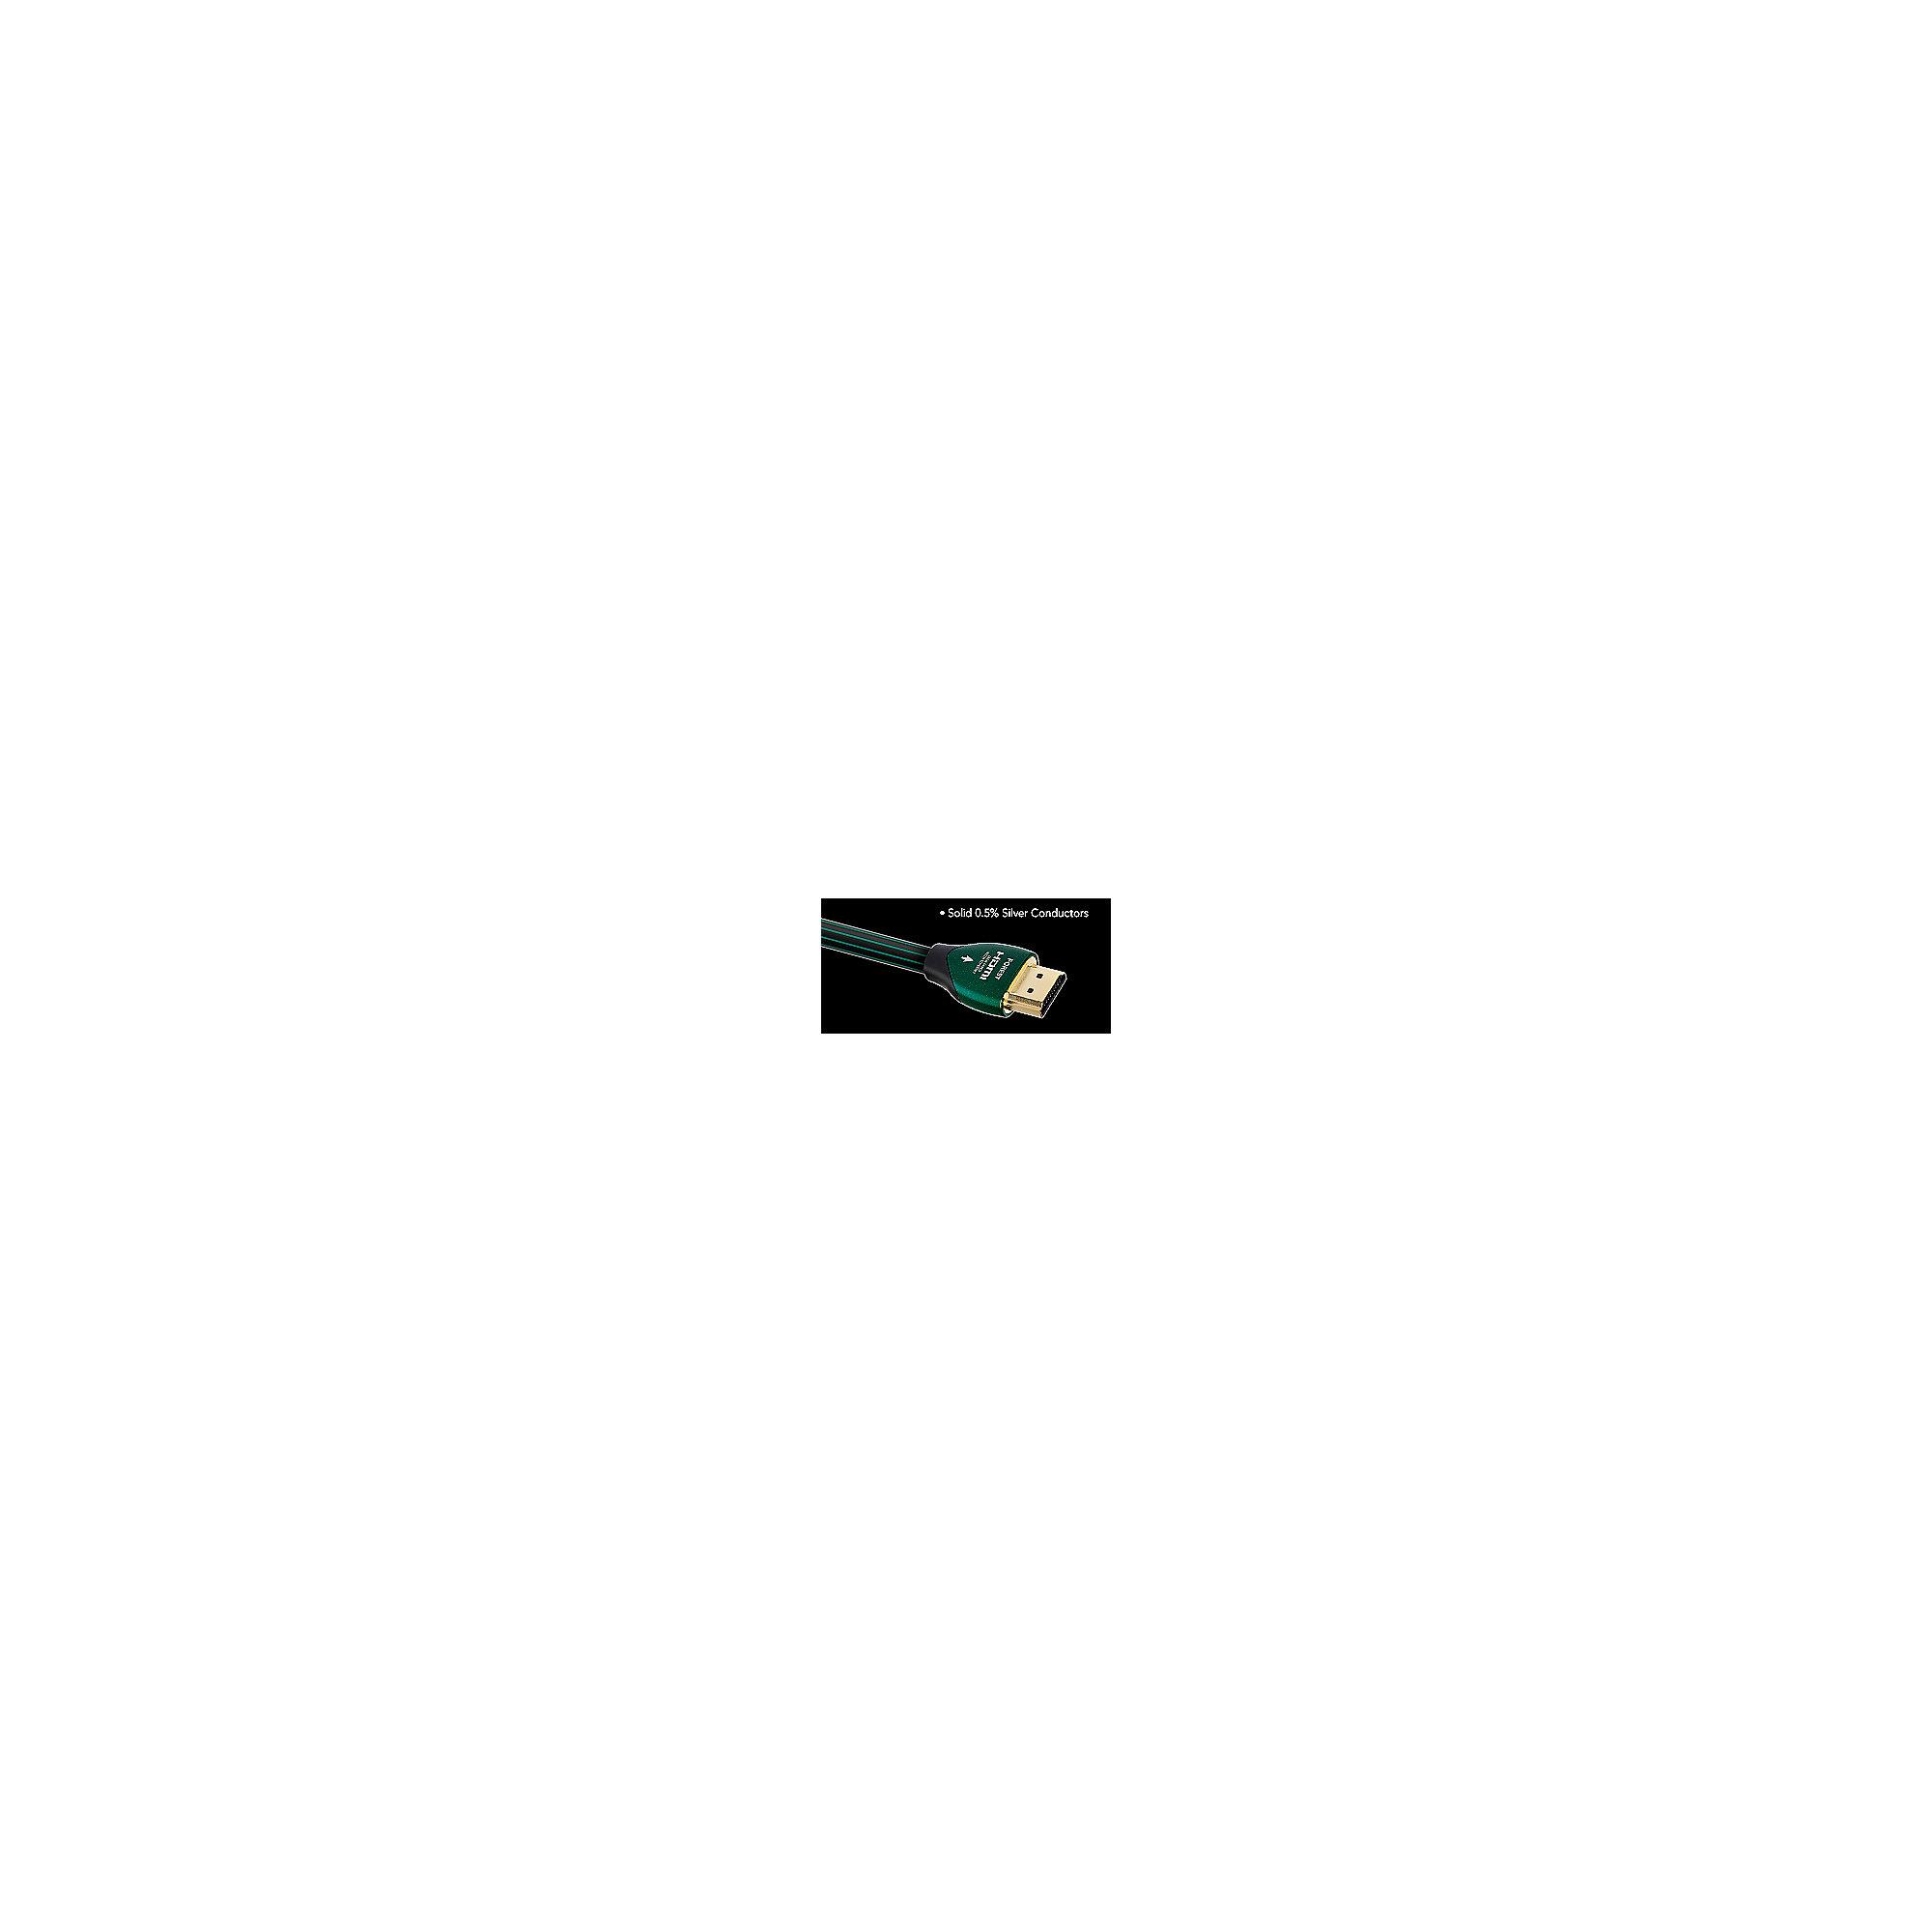 Audioquest FOREST HDMI Kabel 1m Digital A/V grün ++ Cyberport